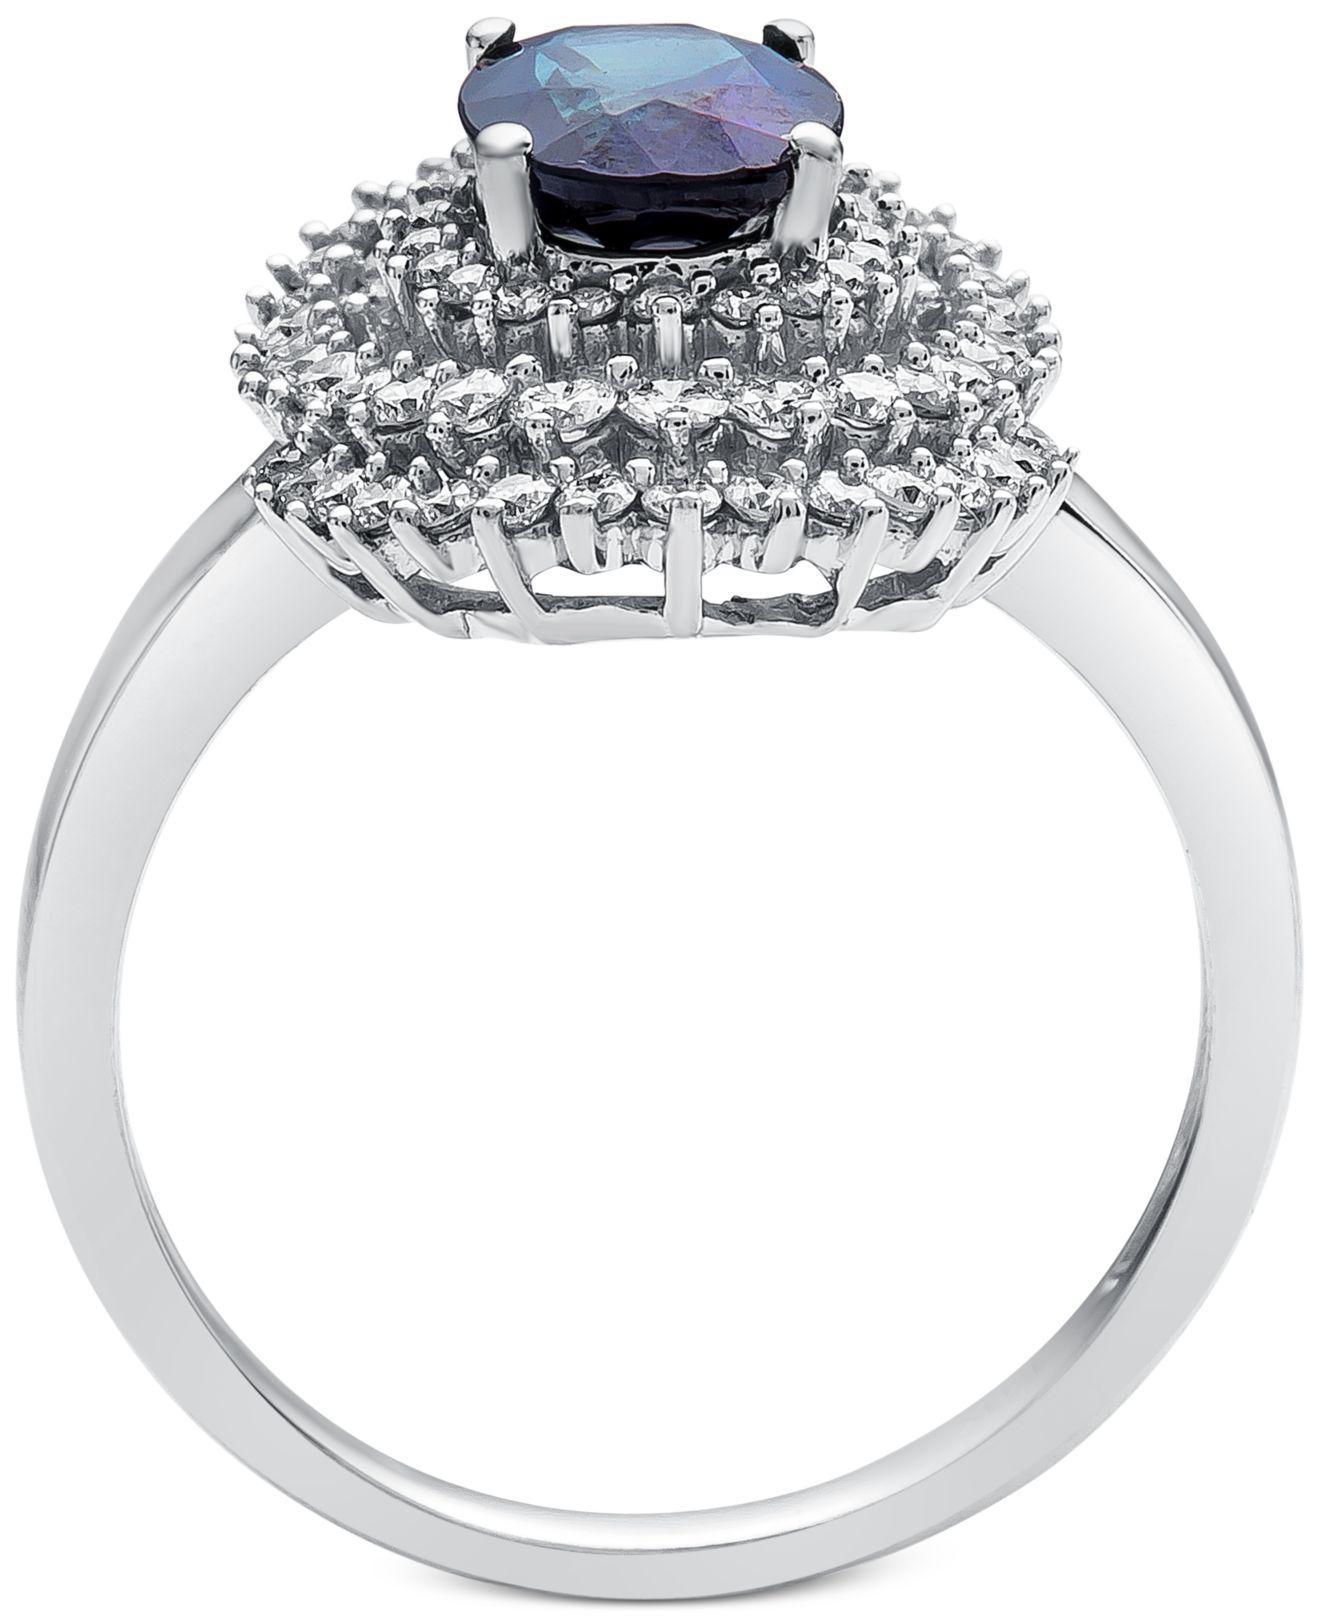 ff1b8d576 Lyst - Macy's Sapphire (1-1/3 Ct. T.w.) & Diamond (3/4 Ct. T.w.) Spiral  Statement Ring In 14k White Gold